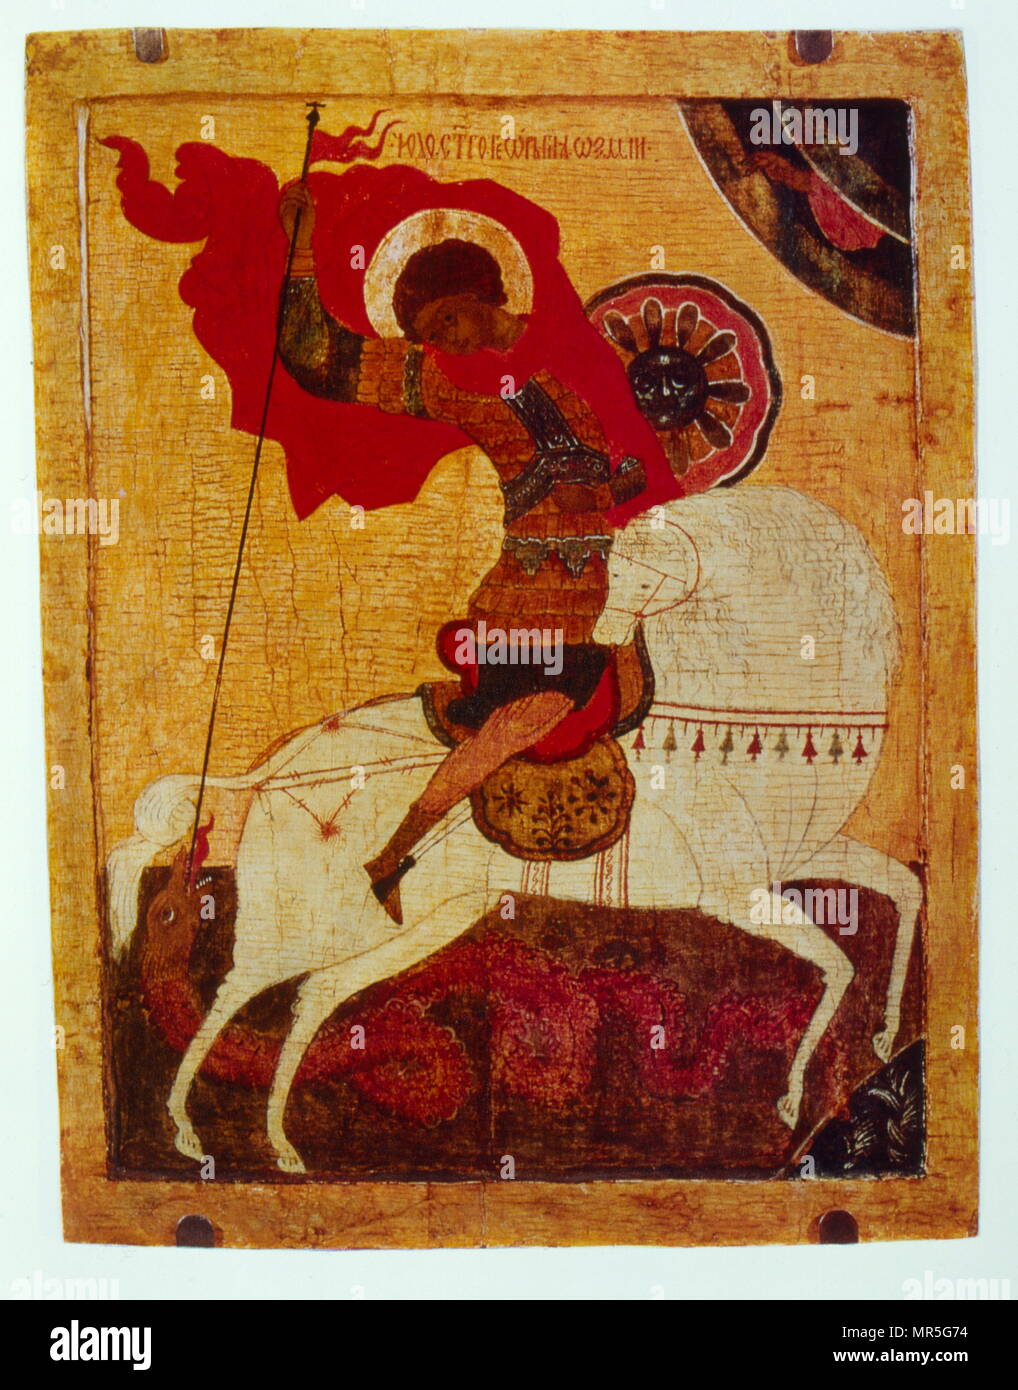 Novgorod school, Russian 15th century icon of St George killing the dragon - Stock Image